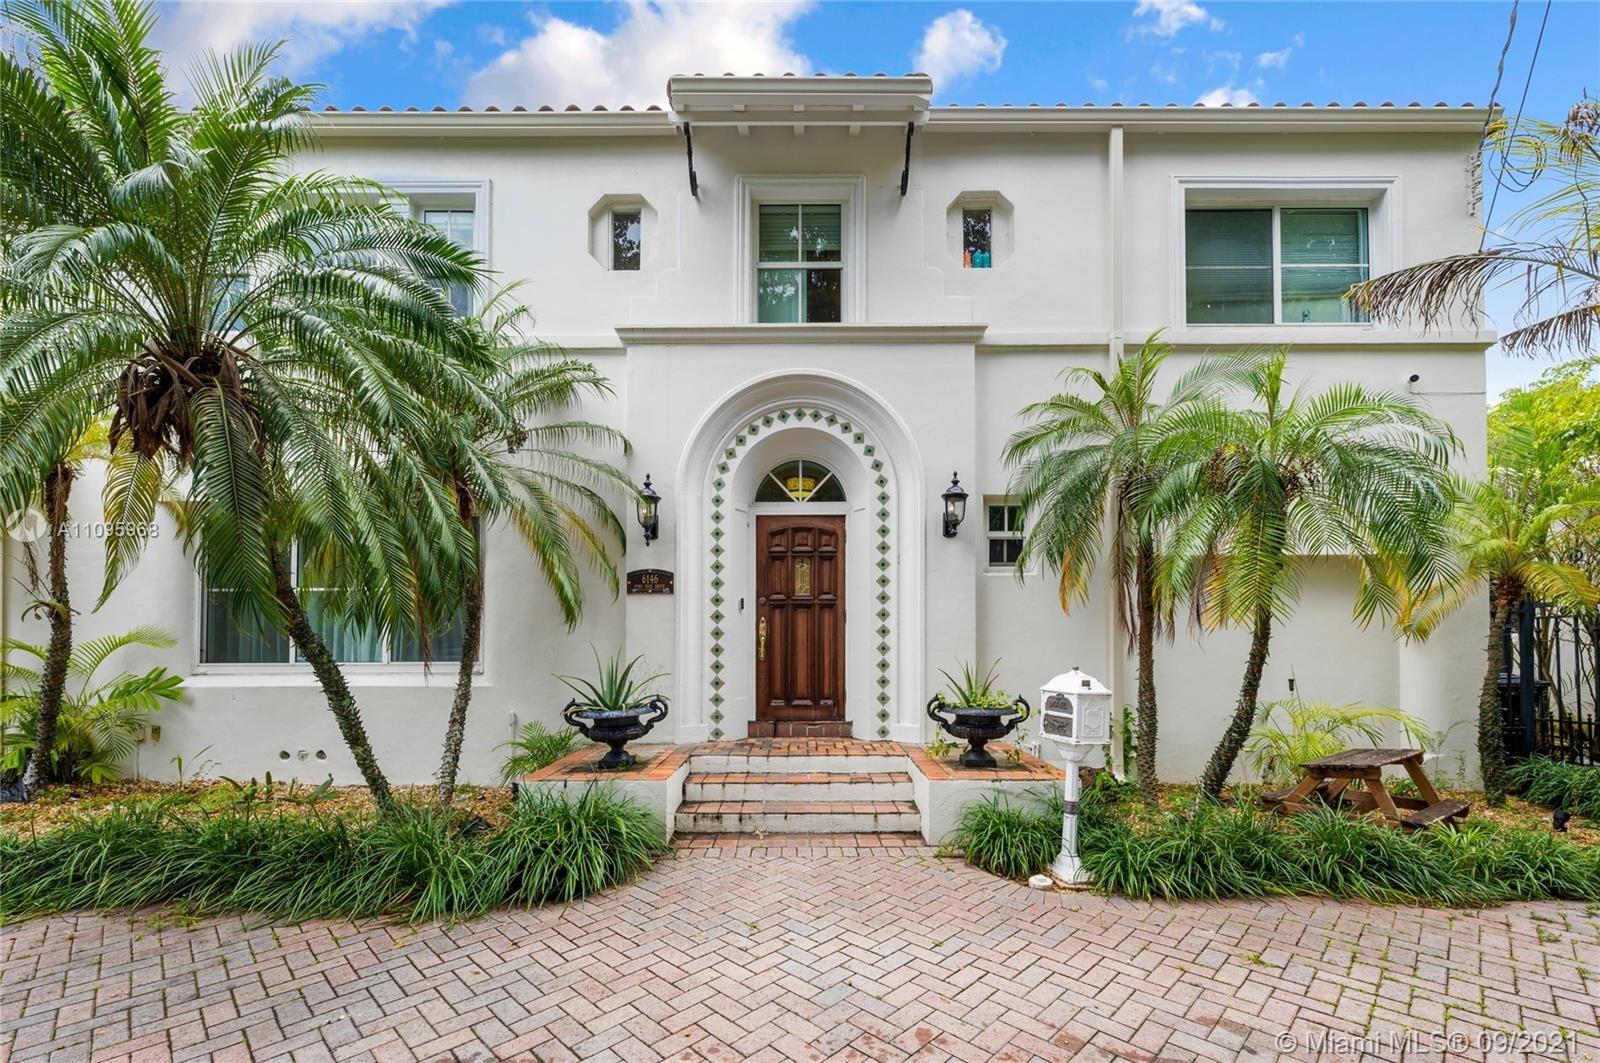 6146 Pine Tree Dr, Miami Beach, FL 33140 - #: A11095968